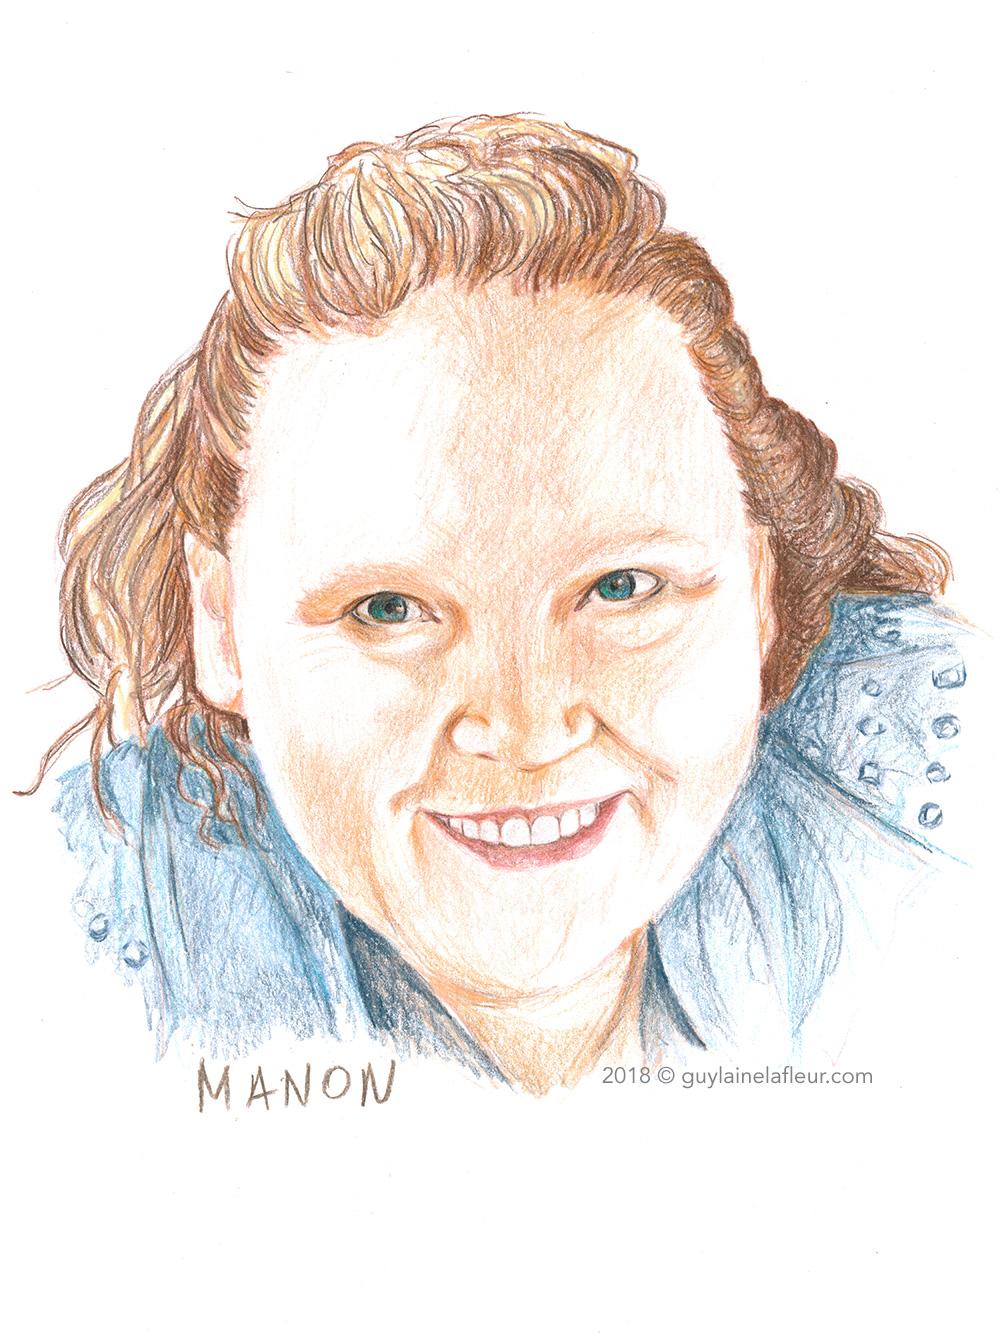 Boule de Quilles (Manon) - Kathleen Fortin